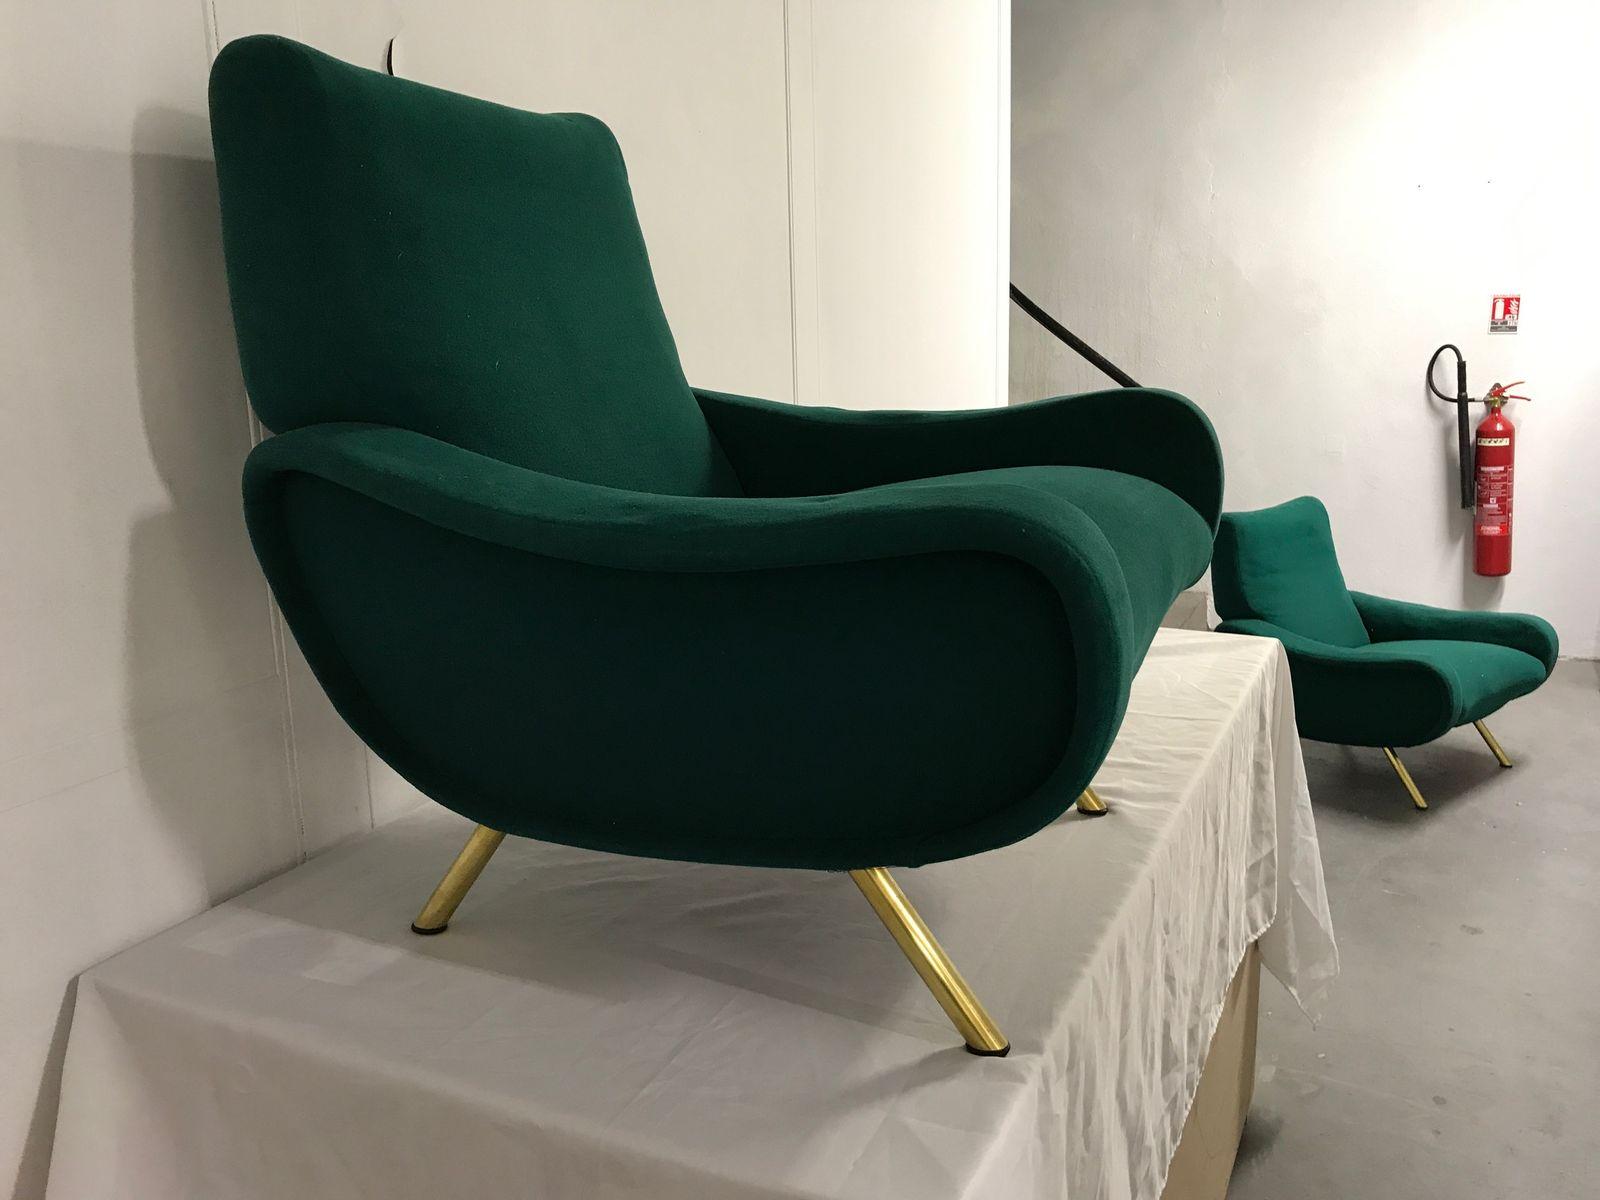 Arflex Poltrone. Fabulous A Pair Of Italian Armchairs By Arflex With ...